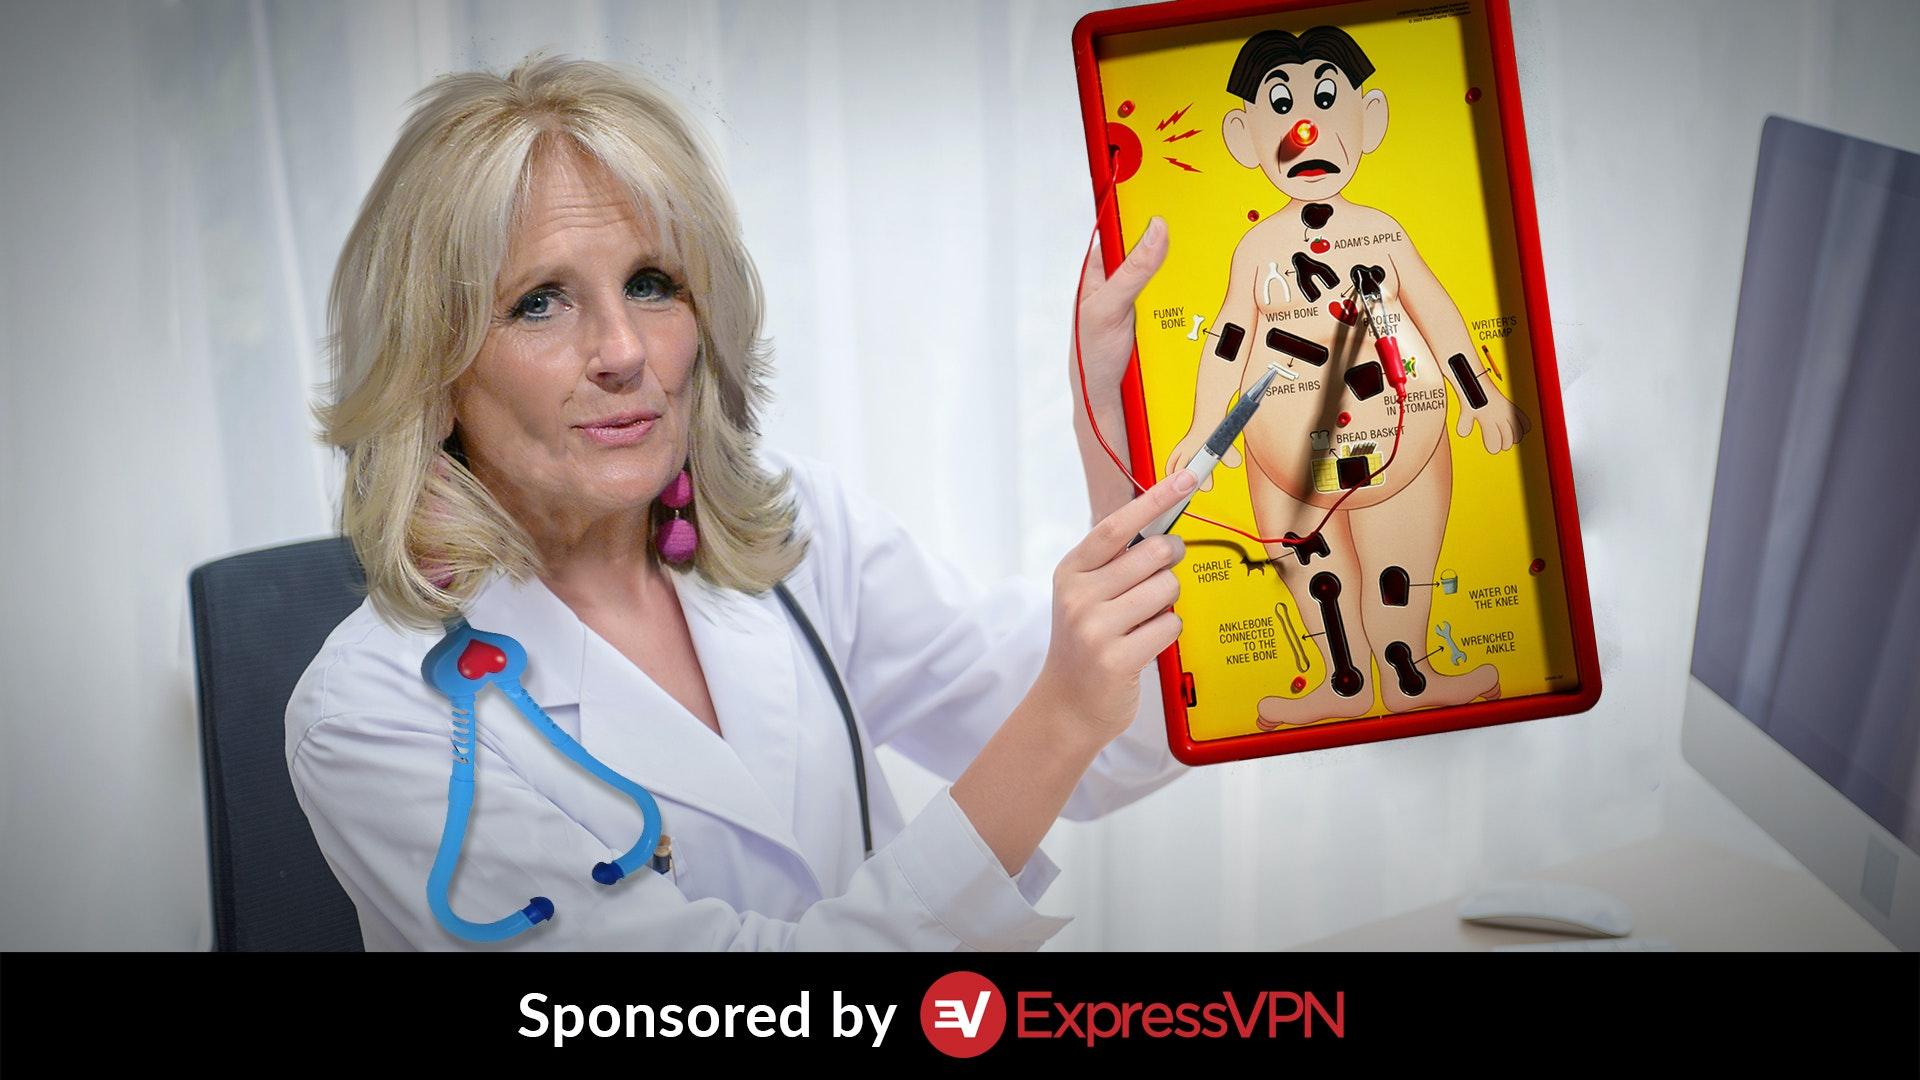 Ep. 1156 - No, Jill Biden Isn't A Real Doctor